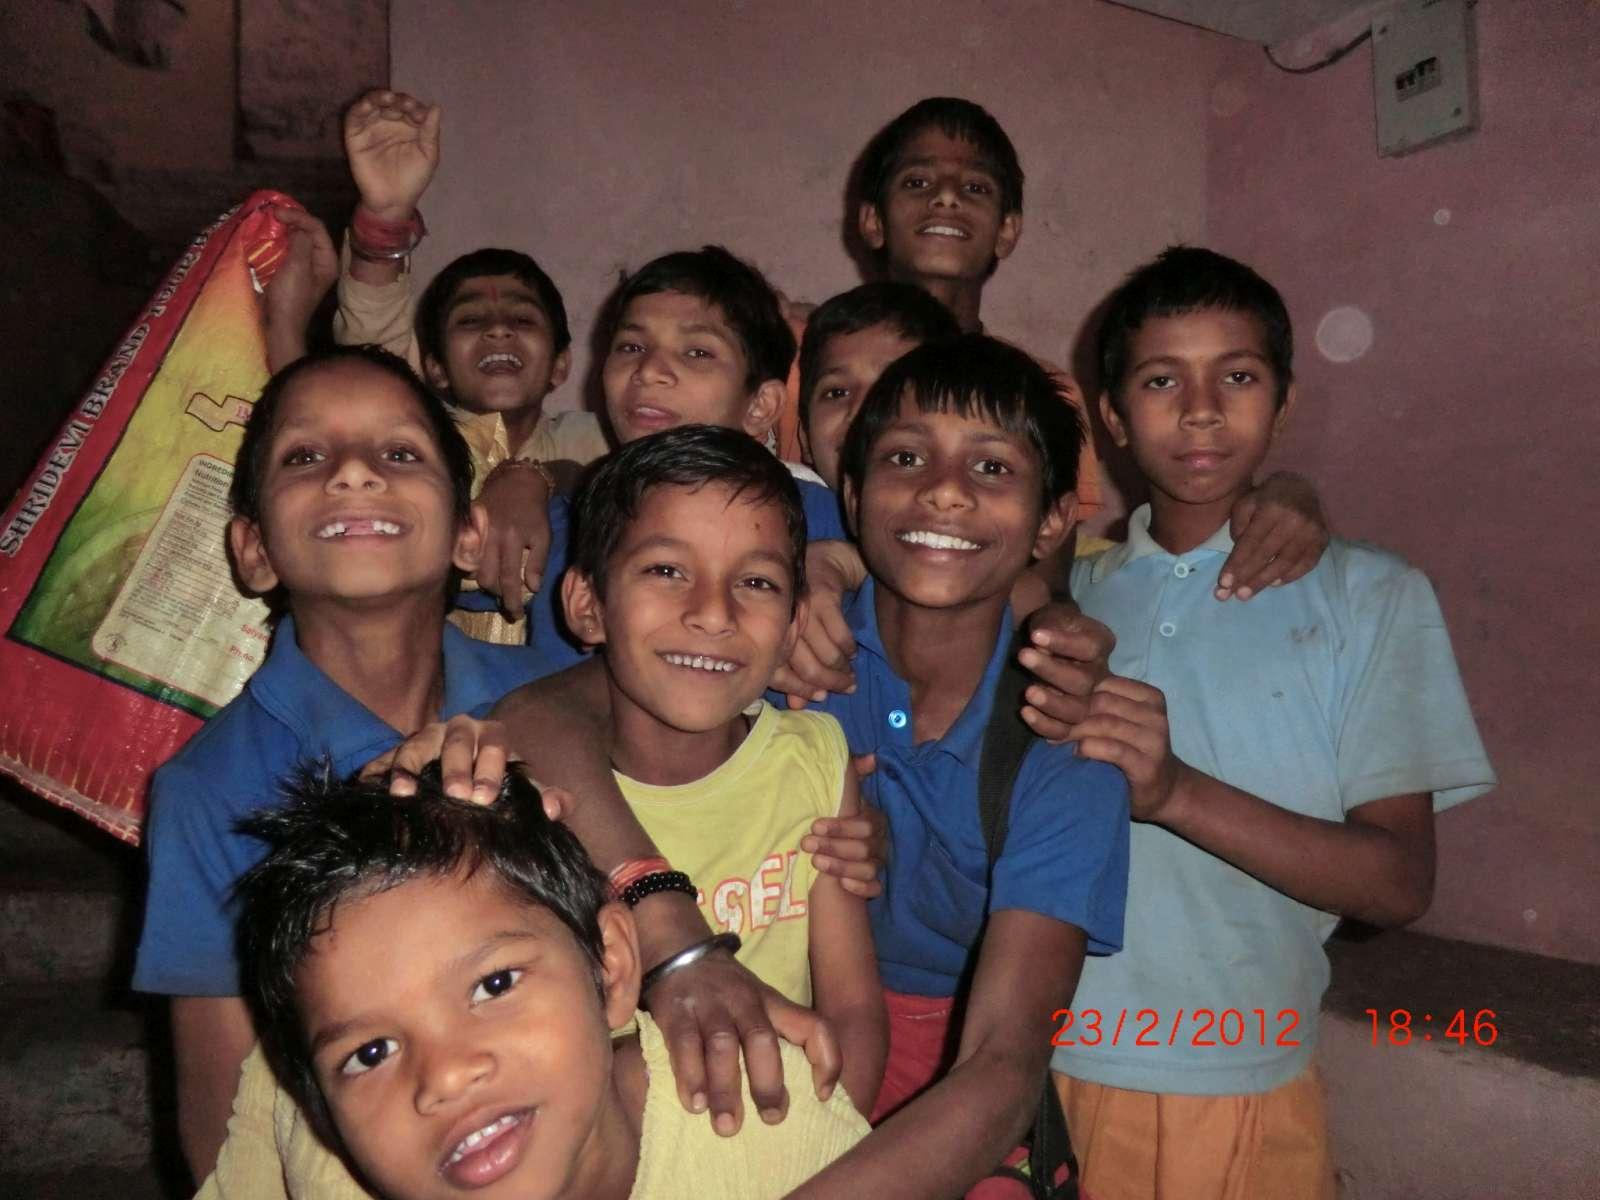 <div class='slider_caption'>                                                      <h1>Holistic education for underprivileged children in Omkareshwar/Middle India</h1>                                                      <a class='slider-readmore' href='https://www.ananda-seva-indienhilfe.org/der-verein-ananda-seva-indienhilfe-e-v/'>                                                      Read more...                                                     </a>                                                      </div>